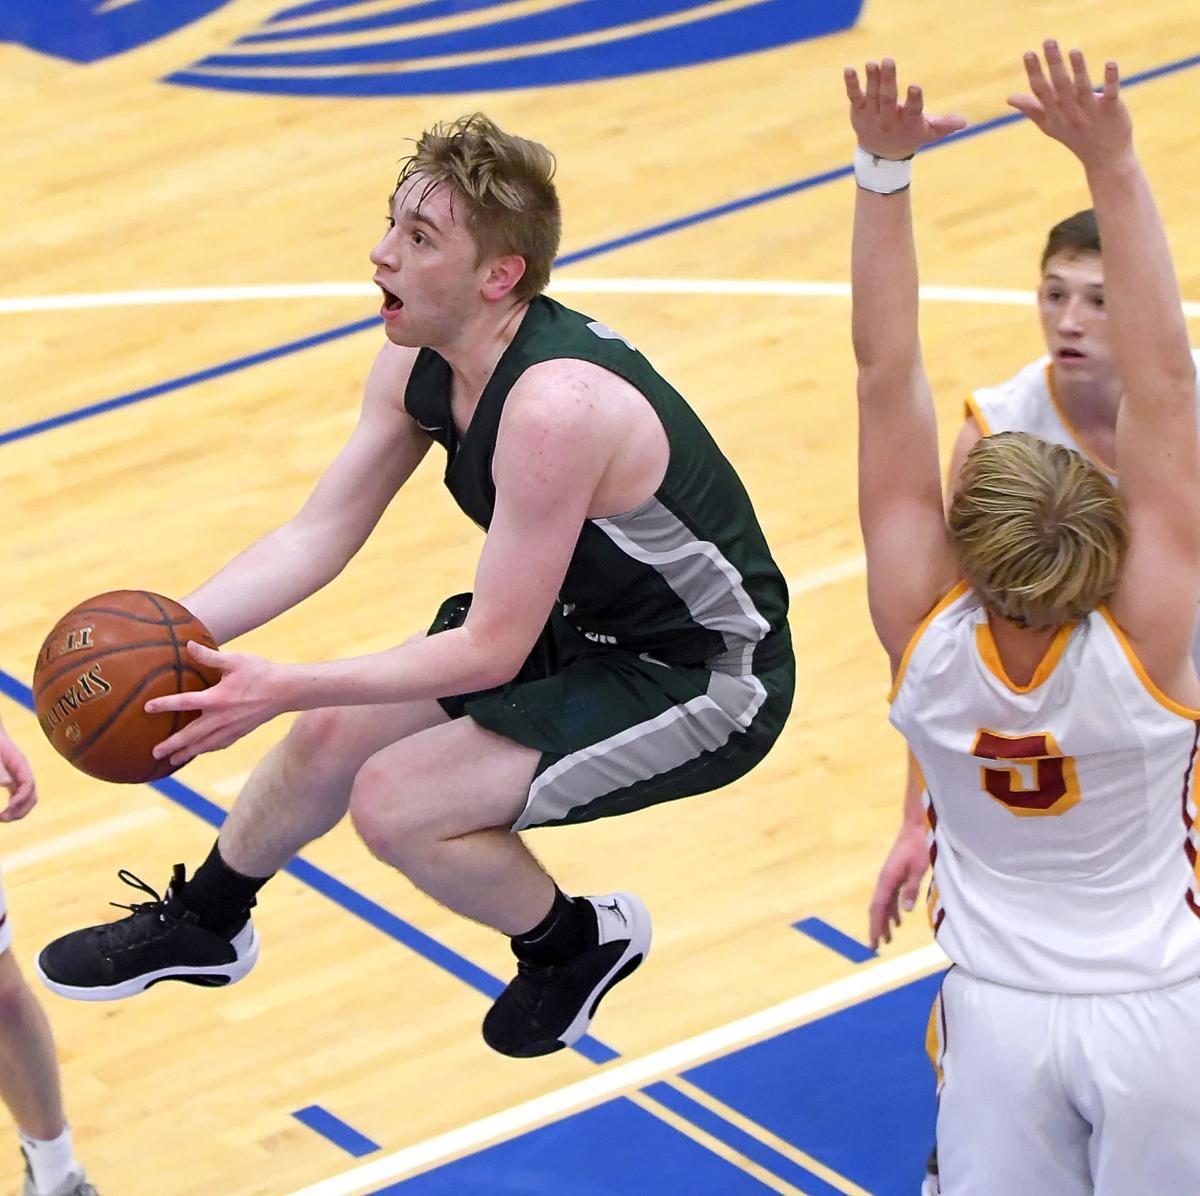 Green Canyon Star Valley Basketball SECONDARY